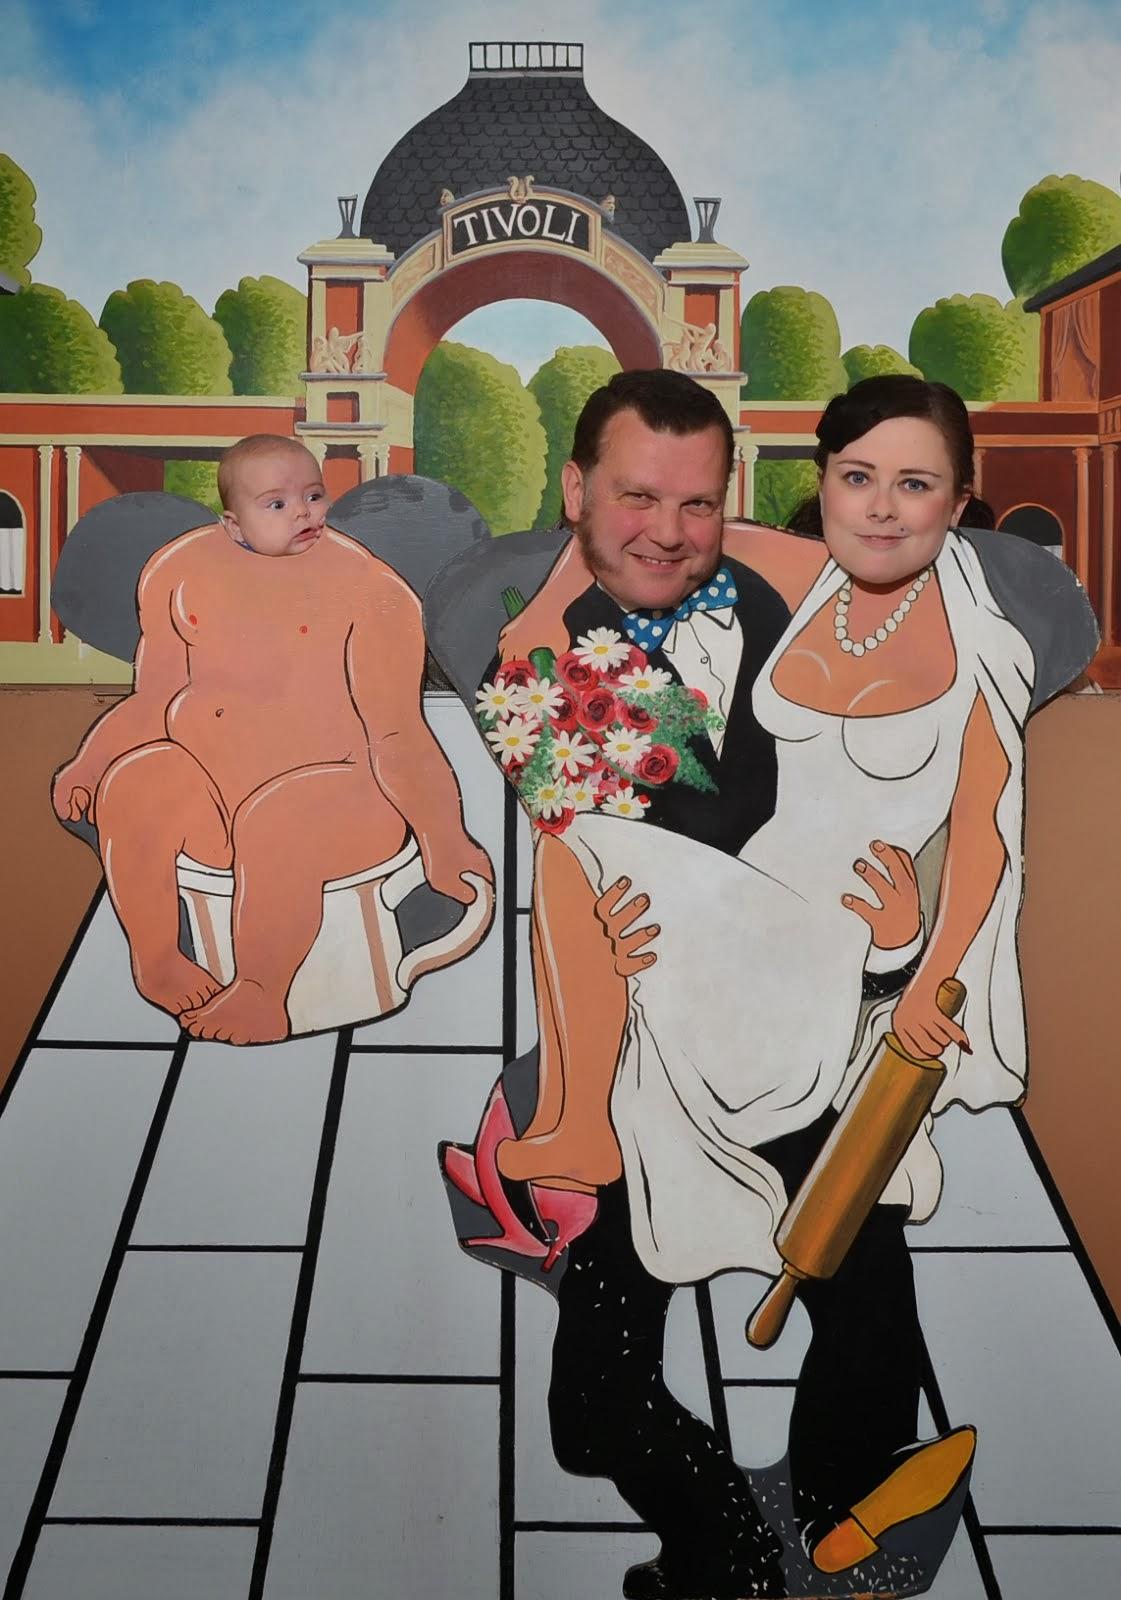 Vores bryllup i Tivoli